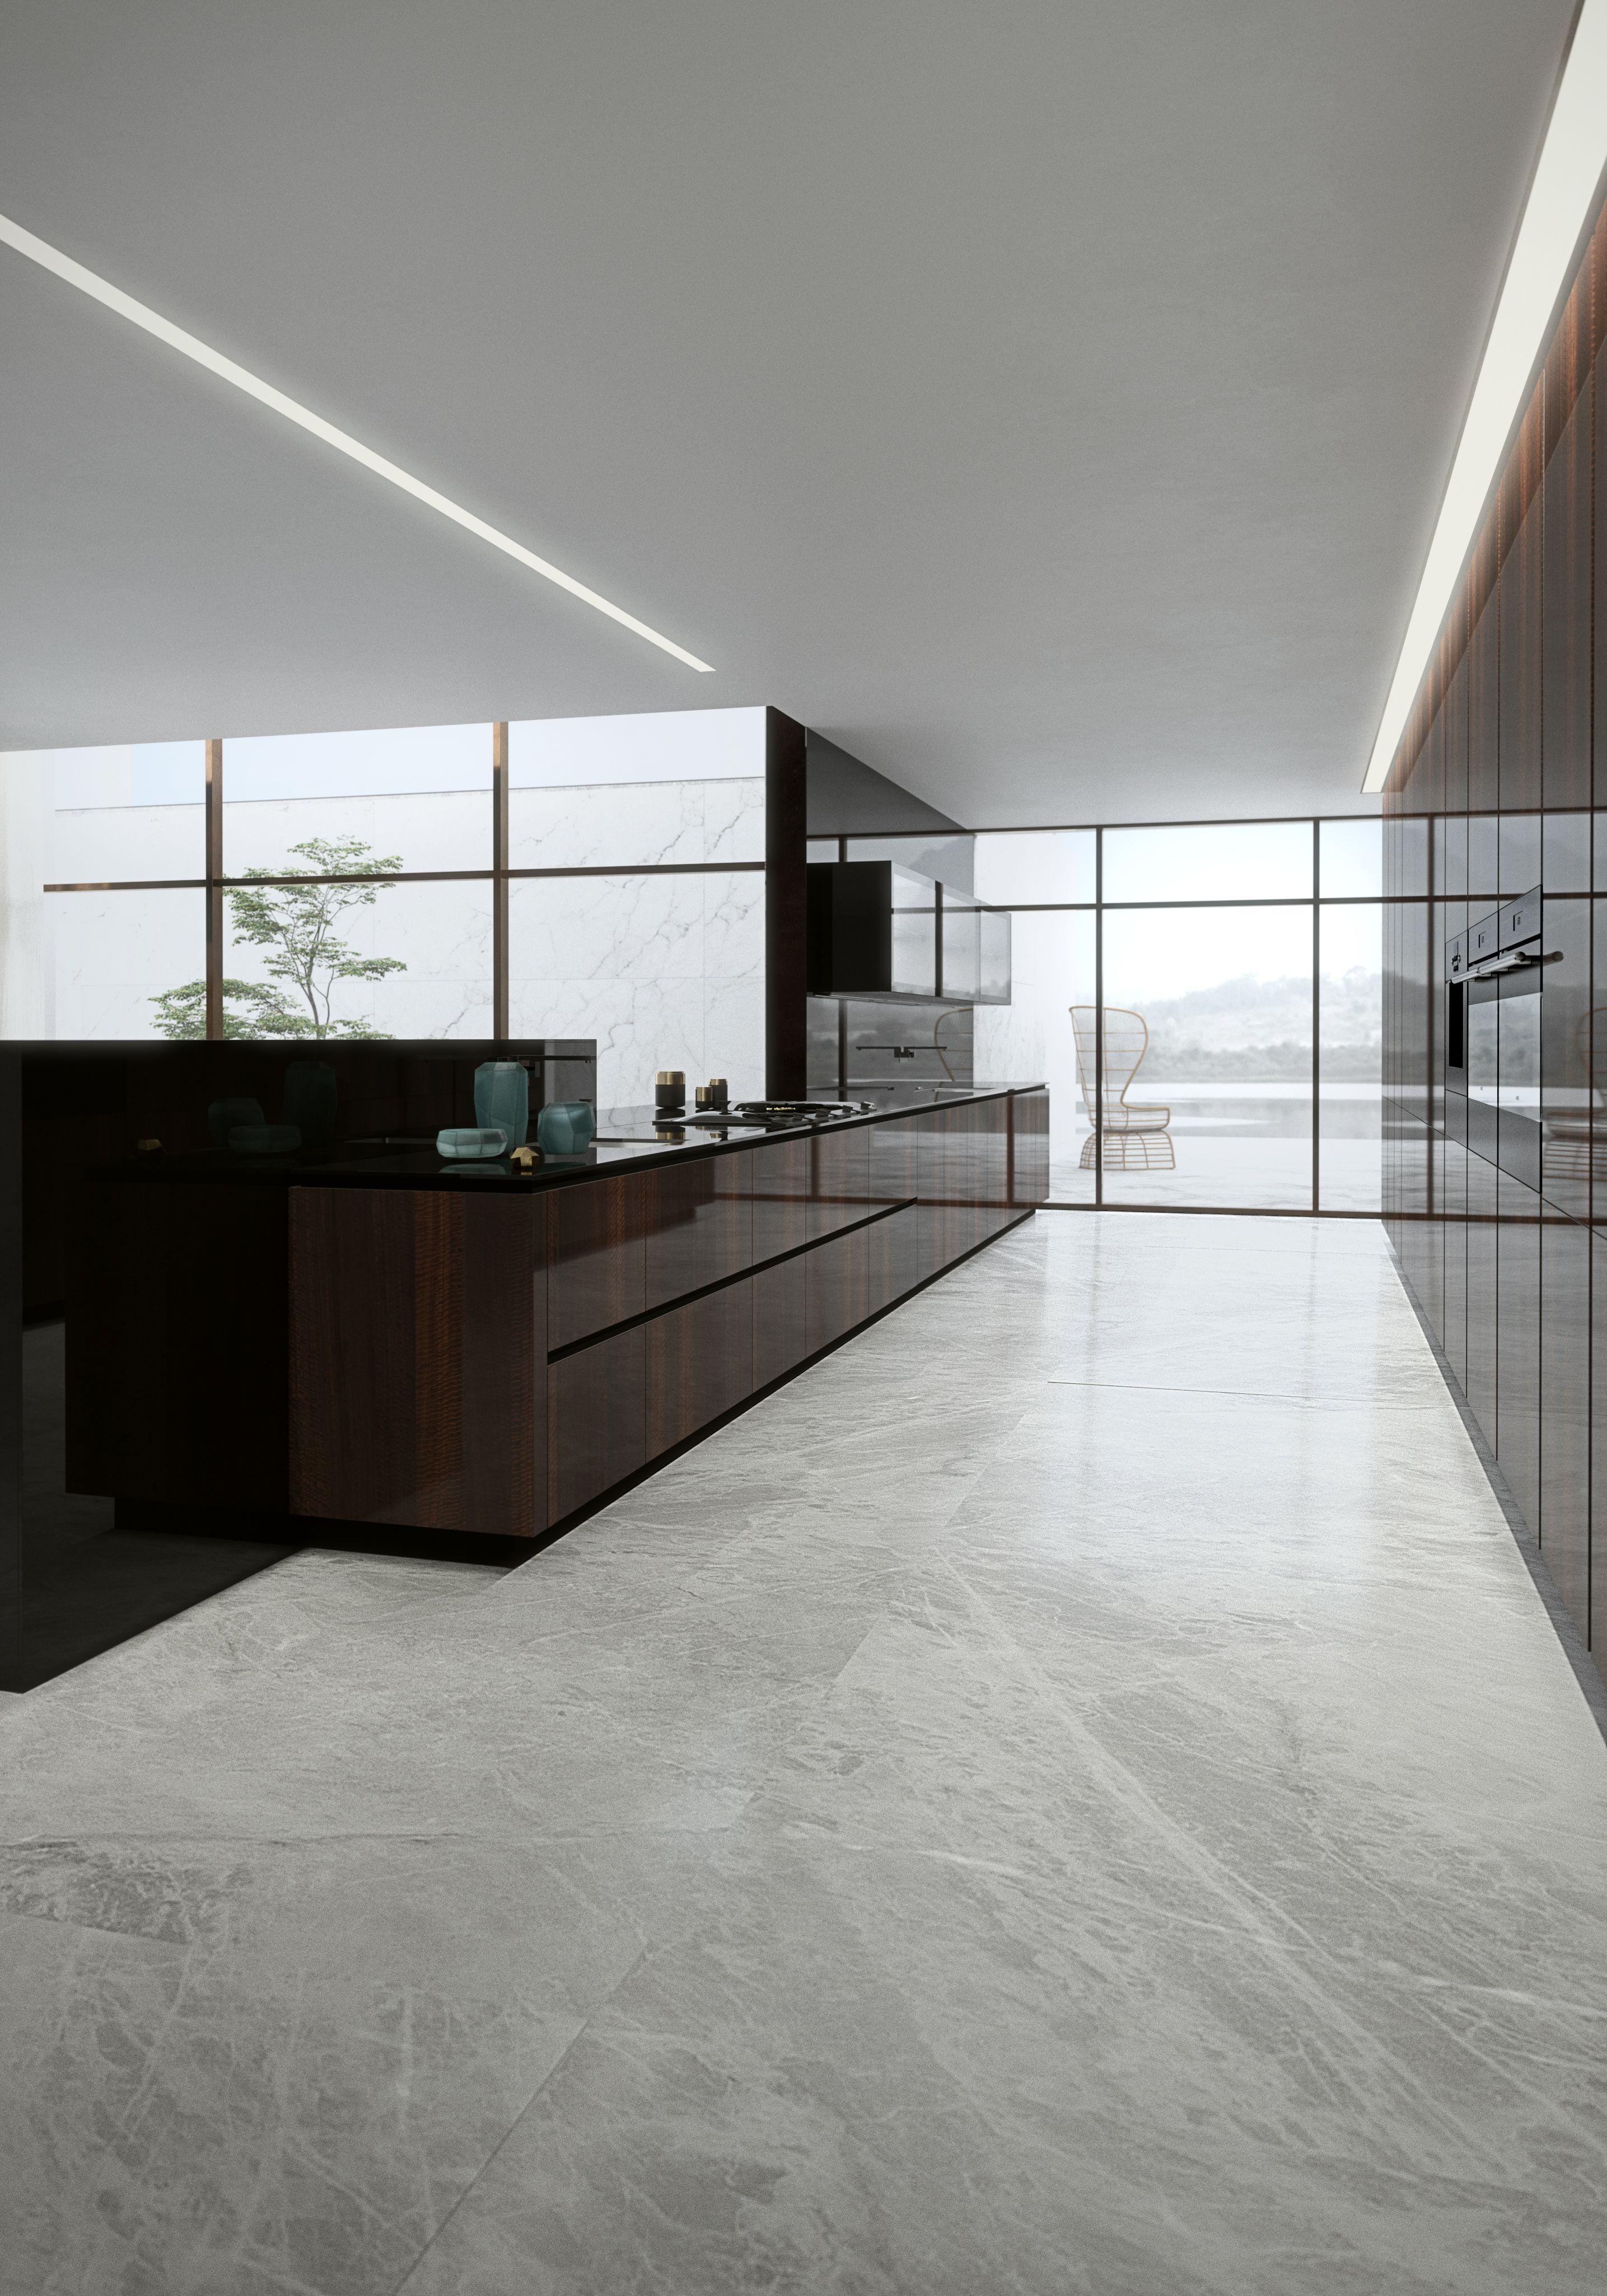 E05 (With images)   Modern kitchen design, Florida design ...